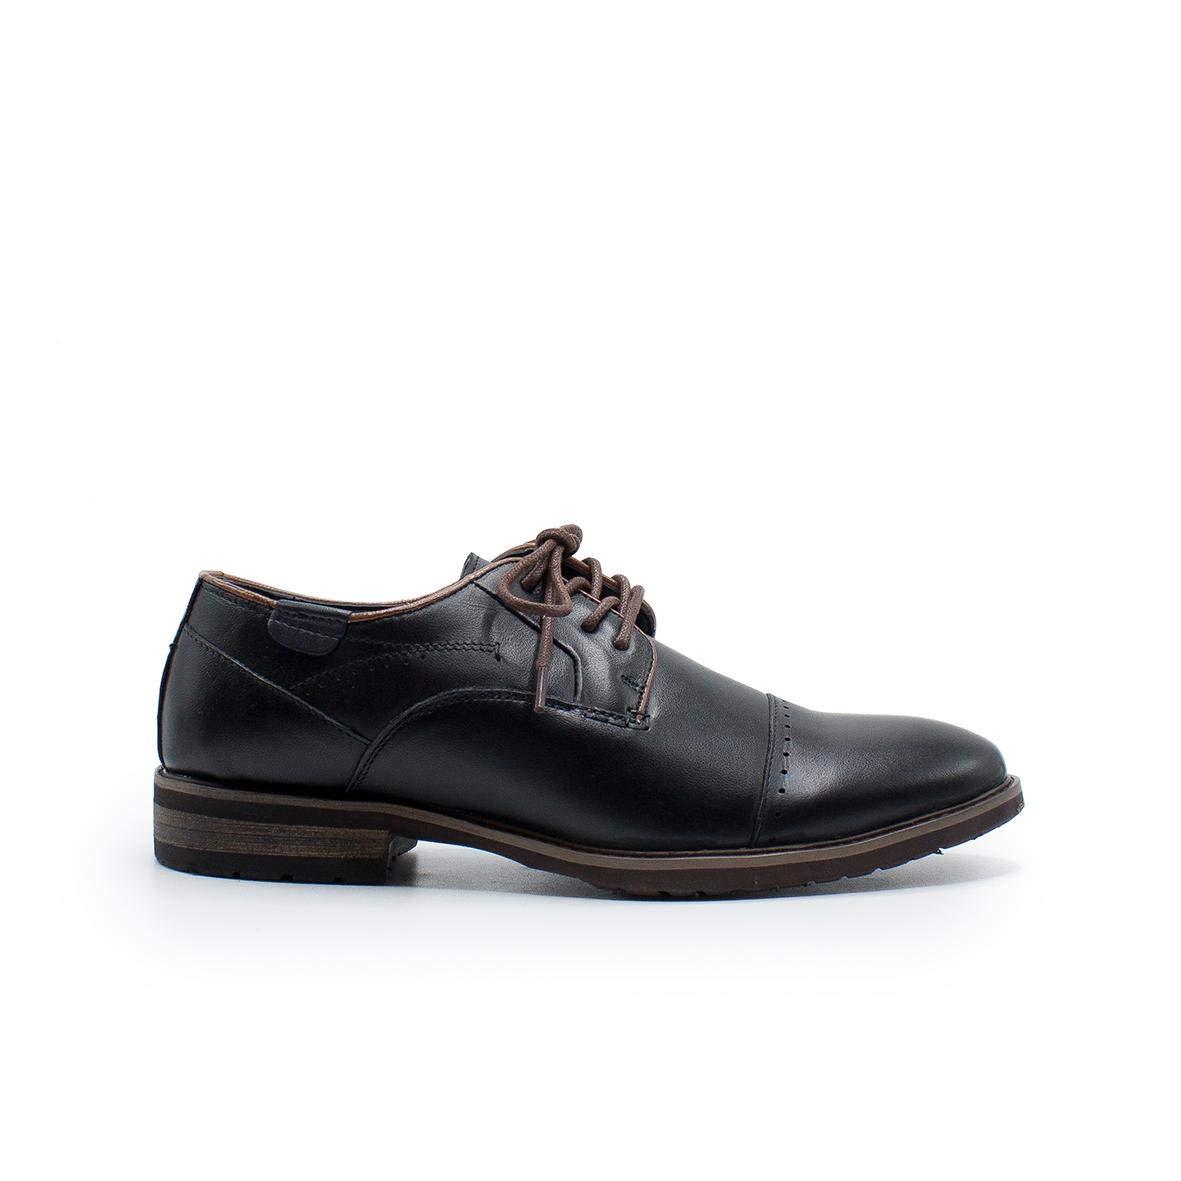 TALLA 44 EU. Zapshop Z80502 Zapato Casual de Vestir de Color Negro para Hombre